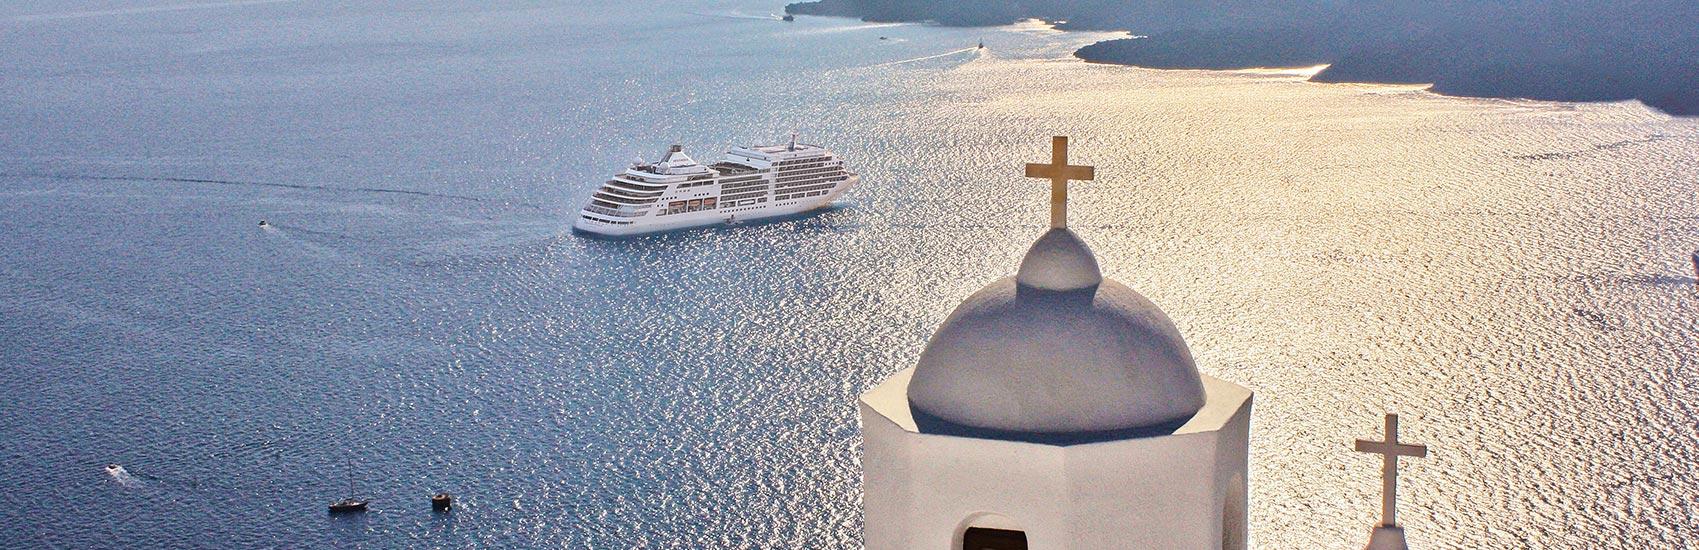 Treasures of the Mediterranean with Silversea